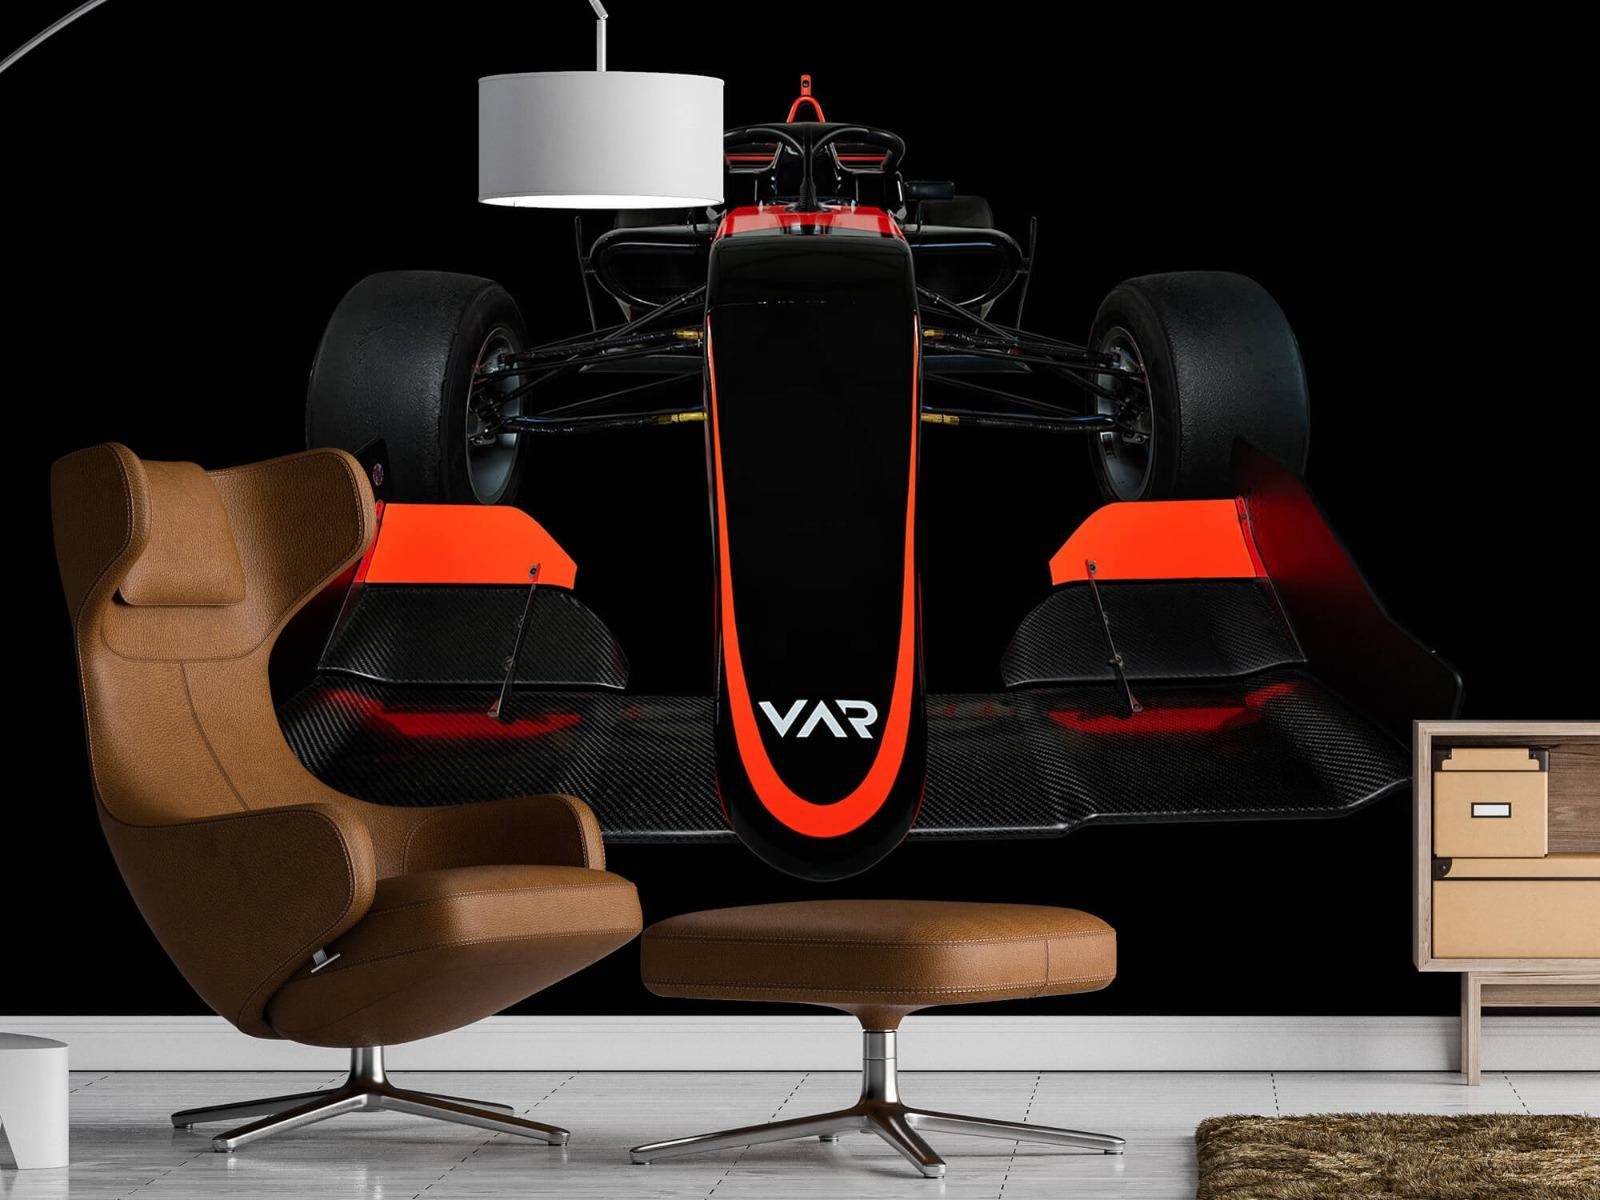 Sportauto's - Formule 3 - Lower front view - dark - Slaapkamer 1